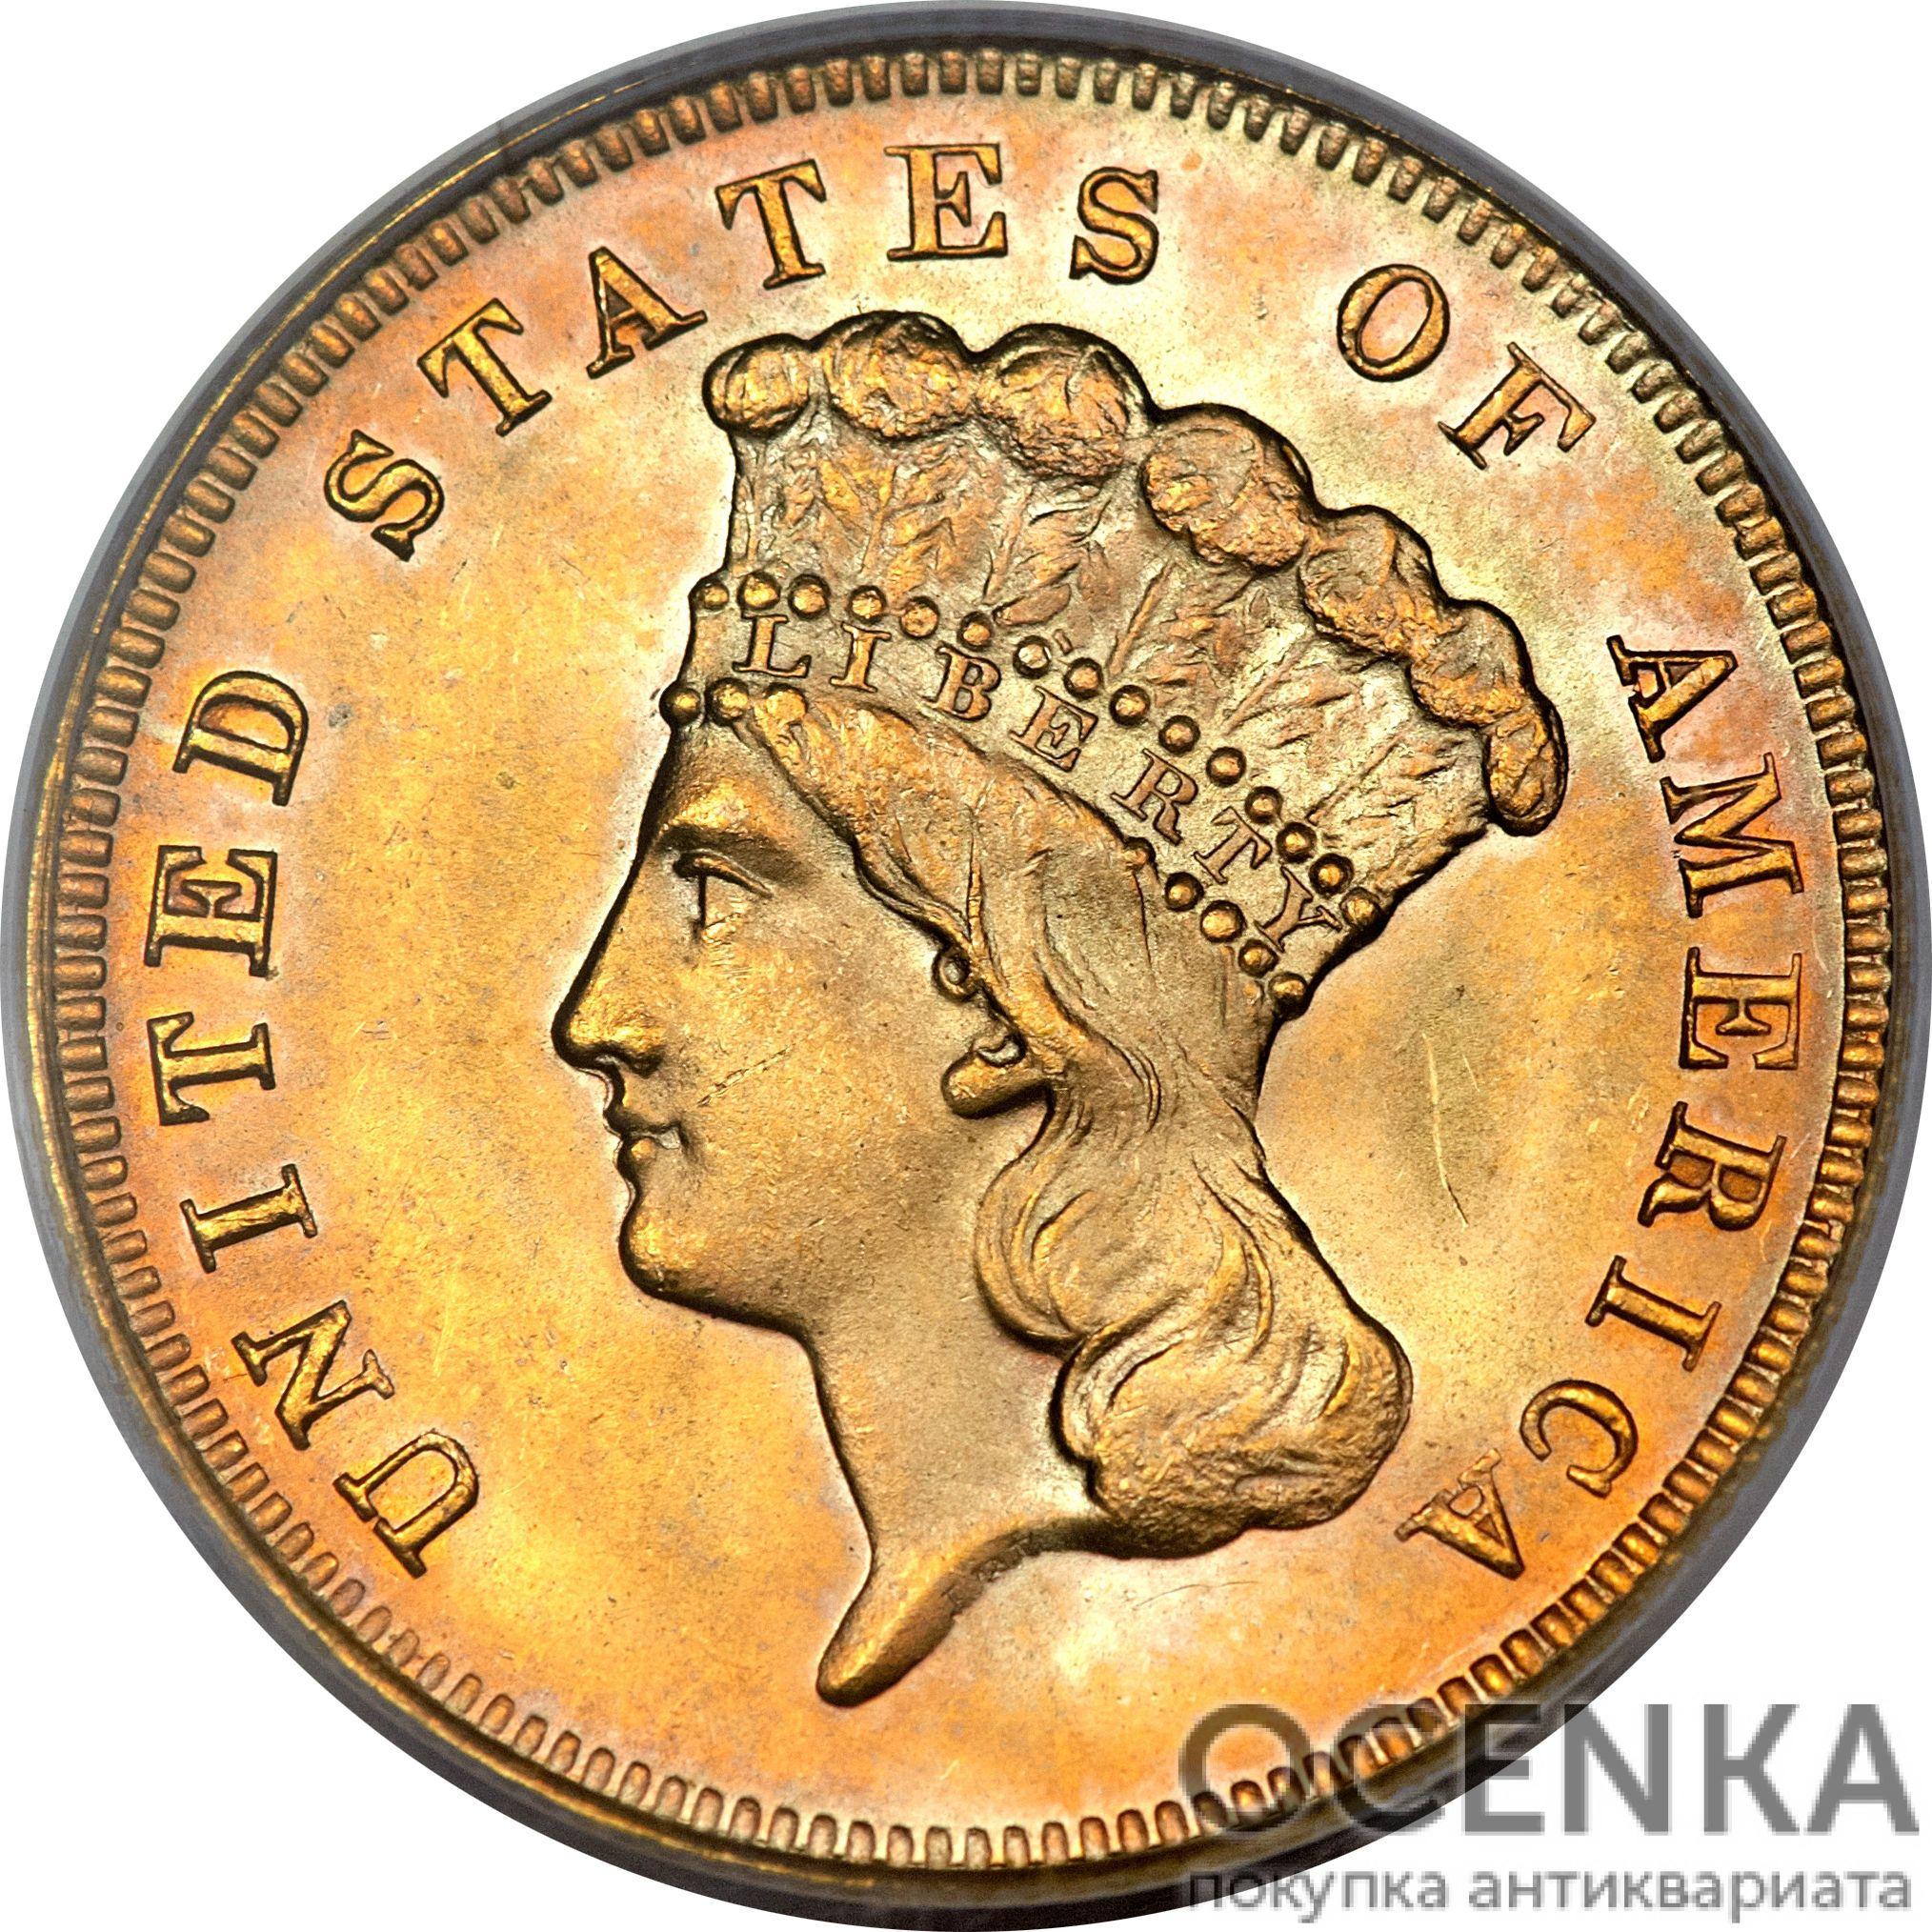 Золотая монета 3 Dollars (3 доллара) США - 1